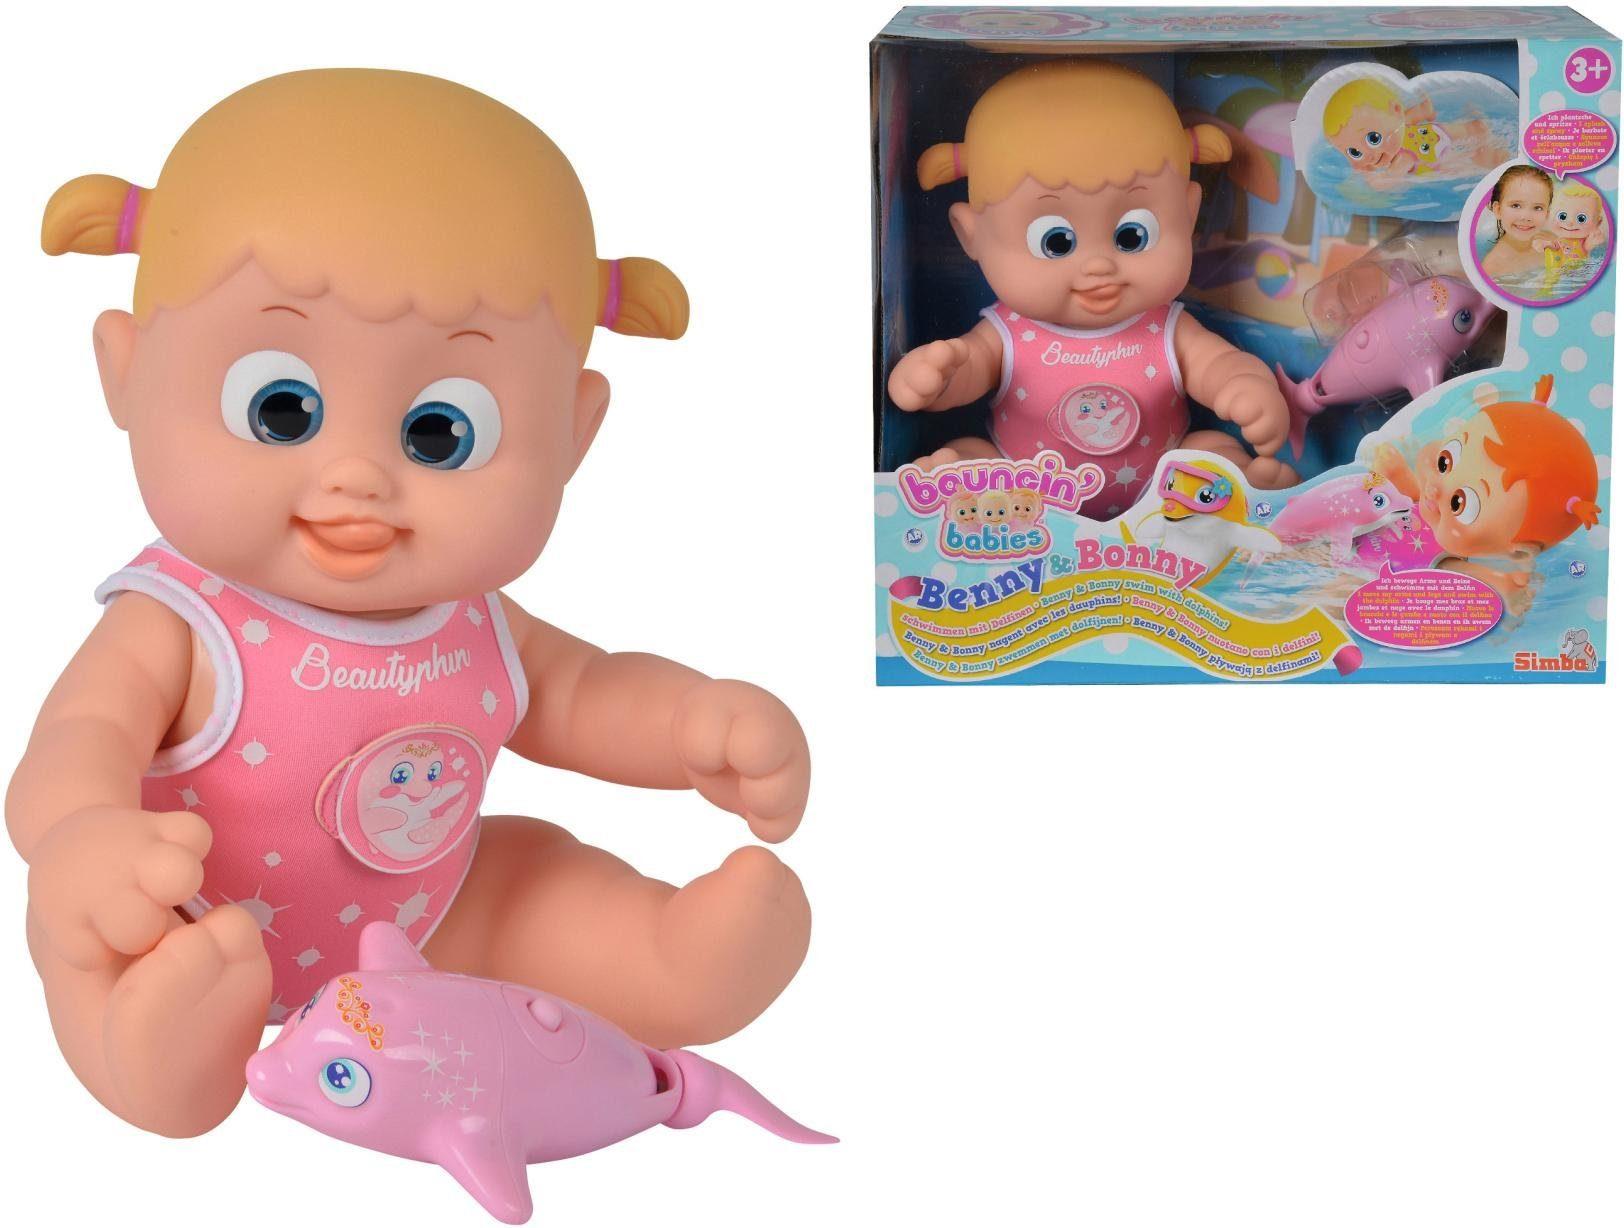 Simba Puppe mit Funktion, »Bouncin' Babies, Bonny schwimmt mit Delfin«